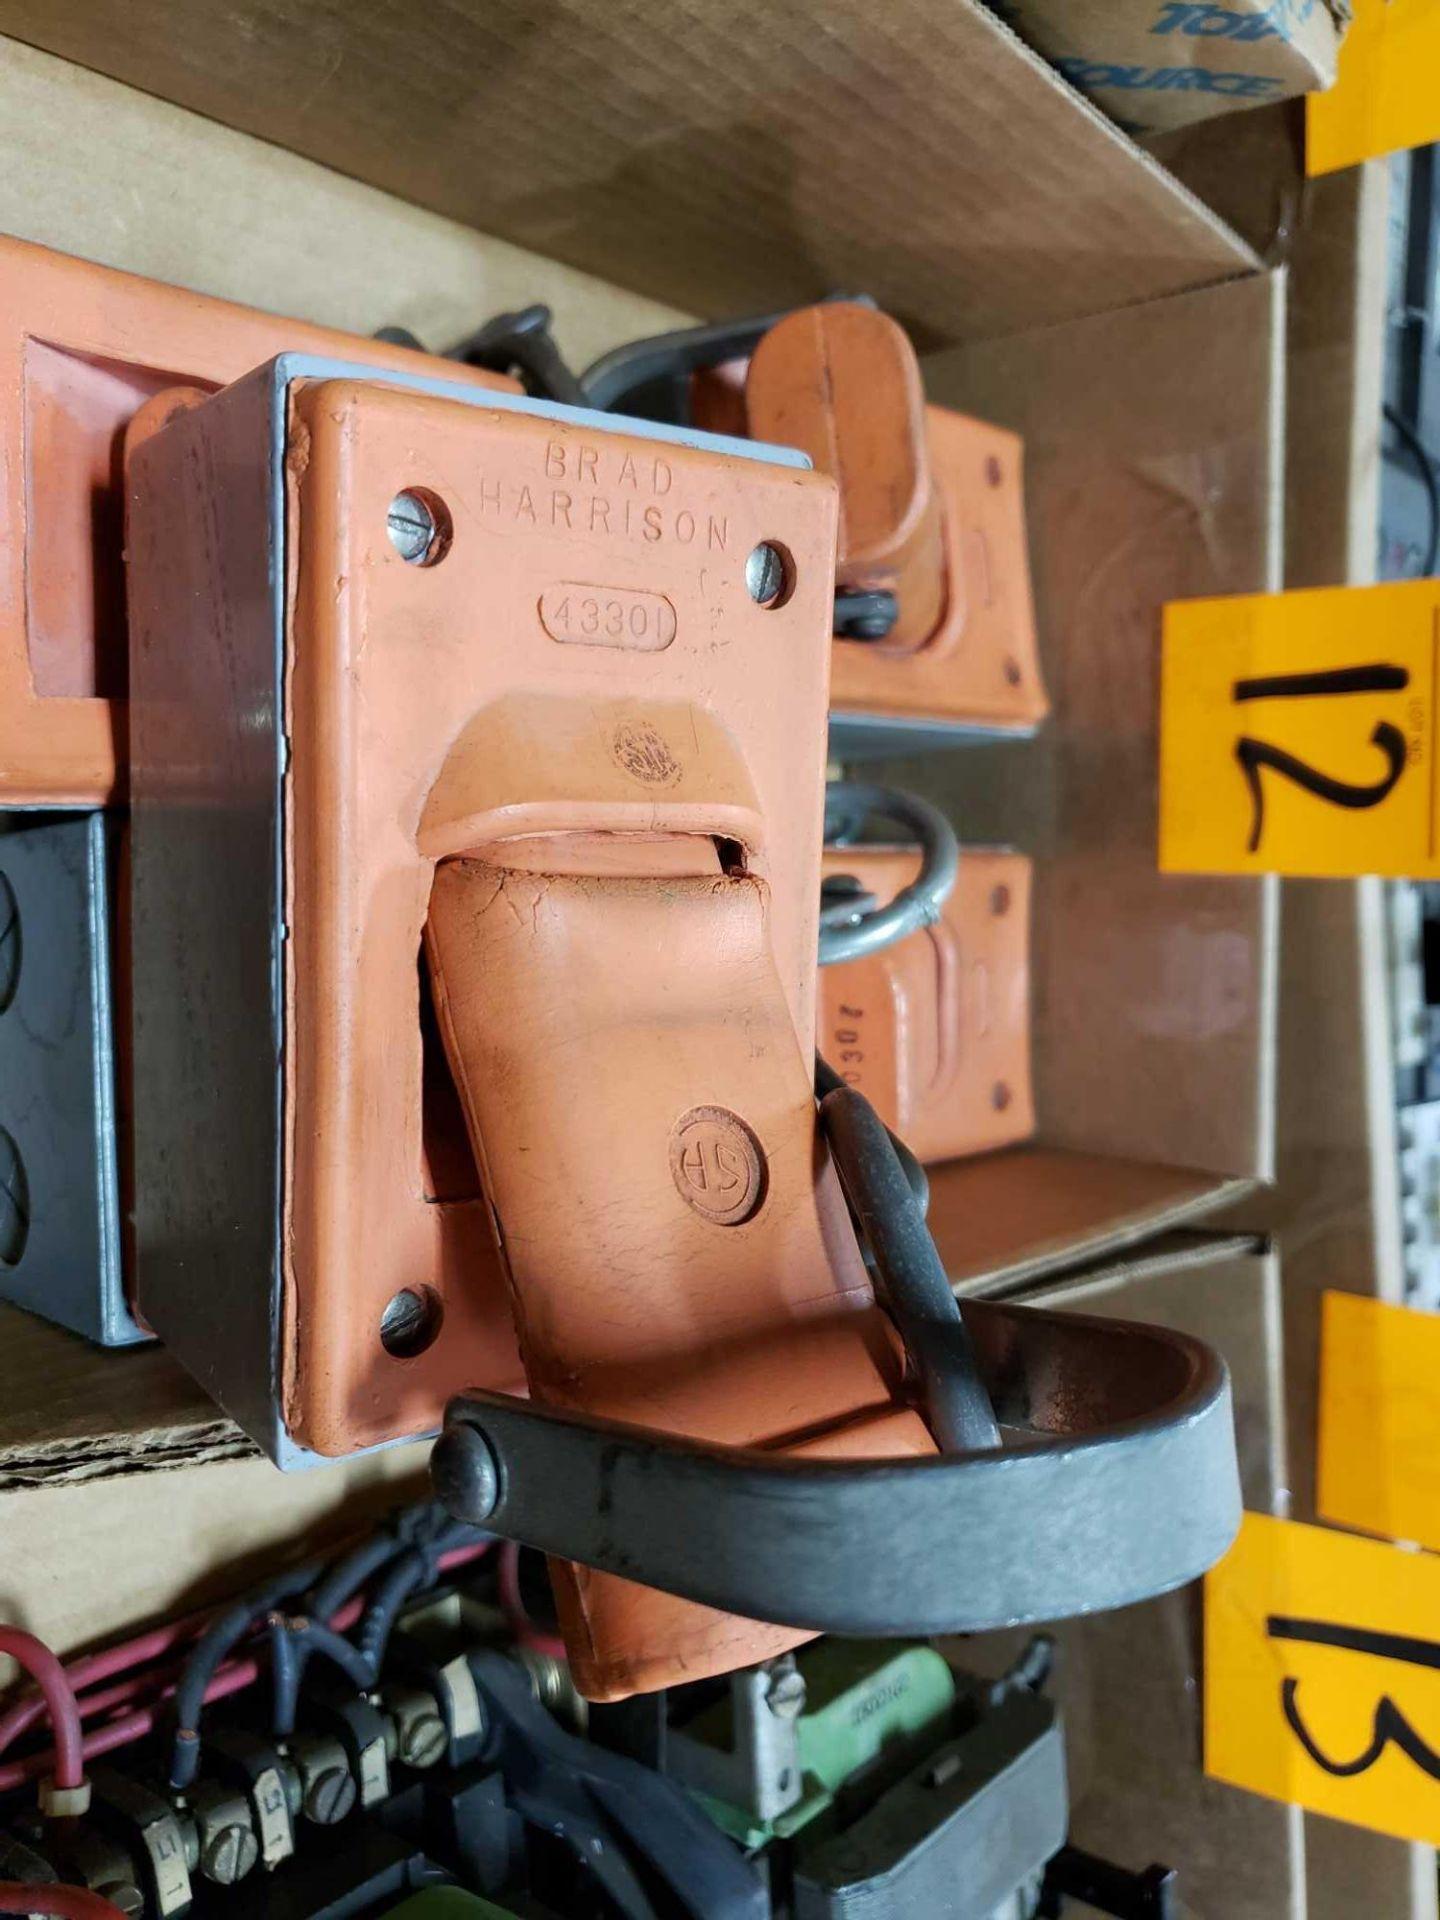 Lot 12 - Qty 5 - Brad Harrison safety plug outlet model 43301.